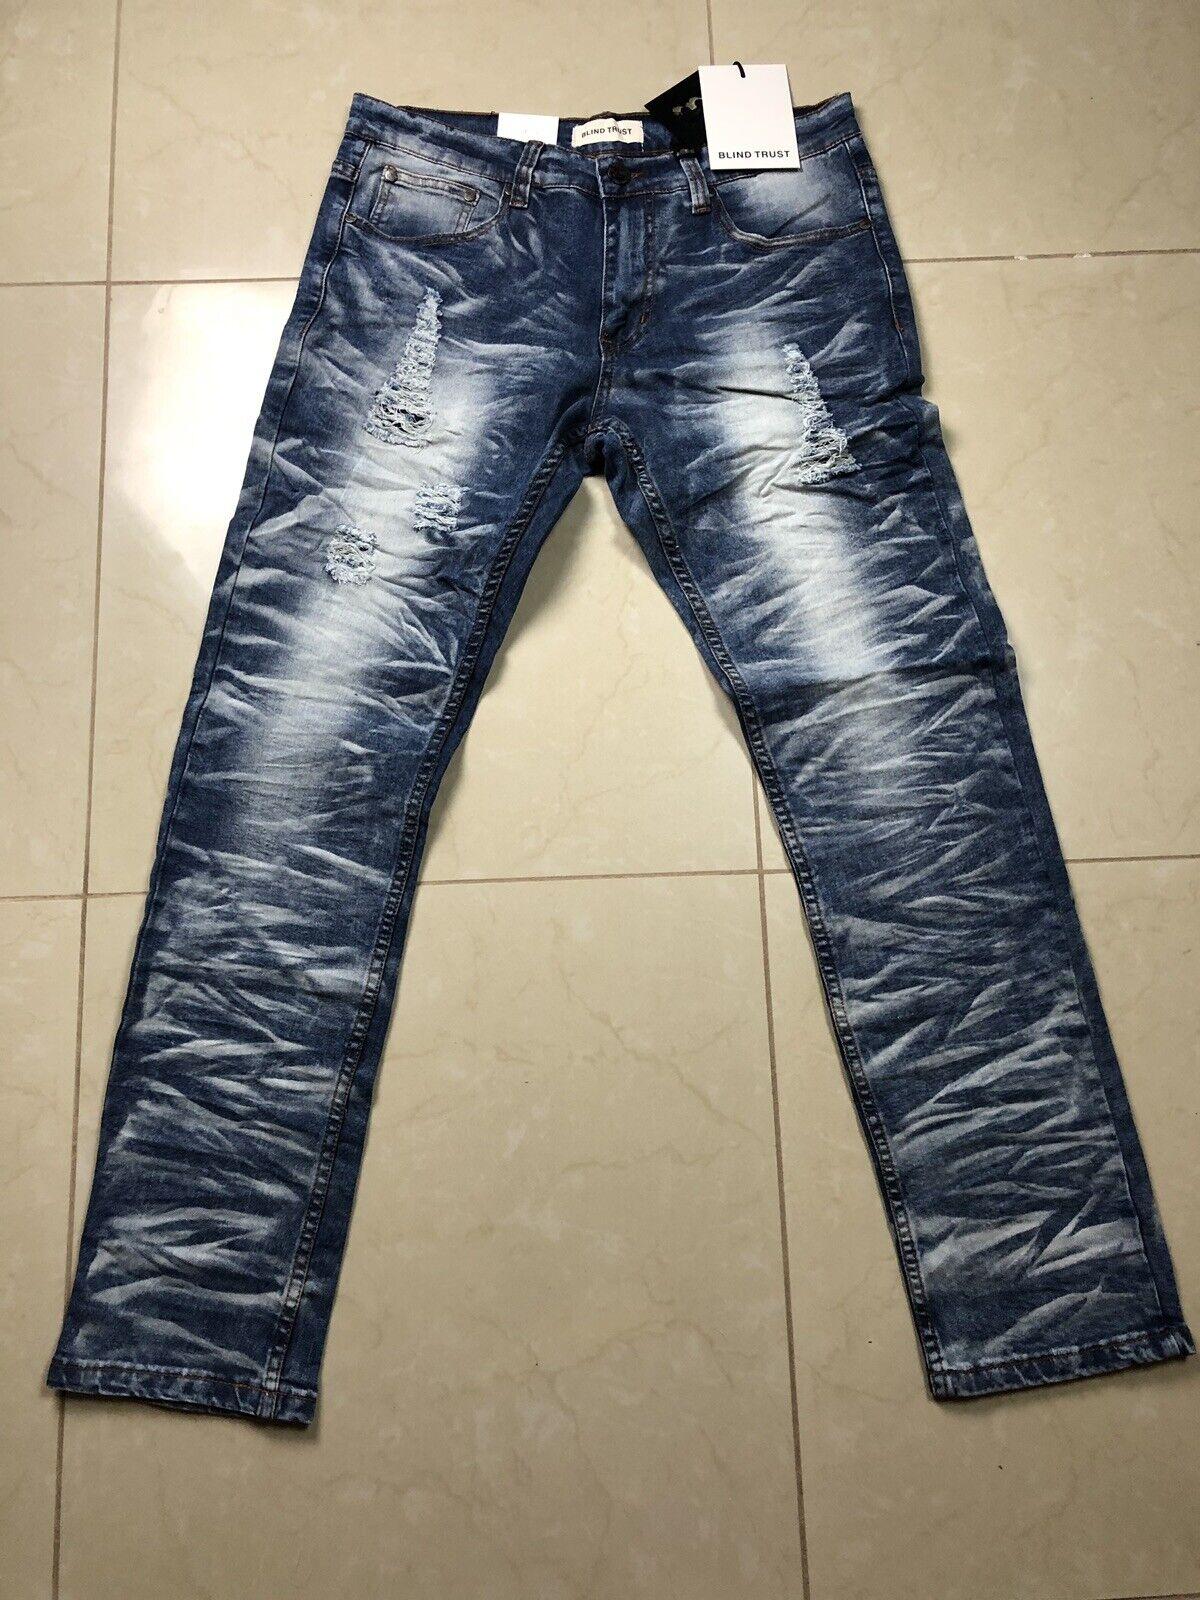 Blind Trust bluee Denim Jean Slim Fit Size 38x32